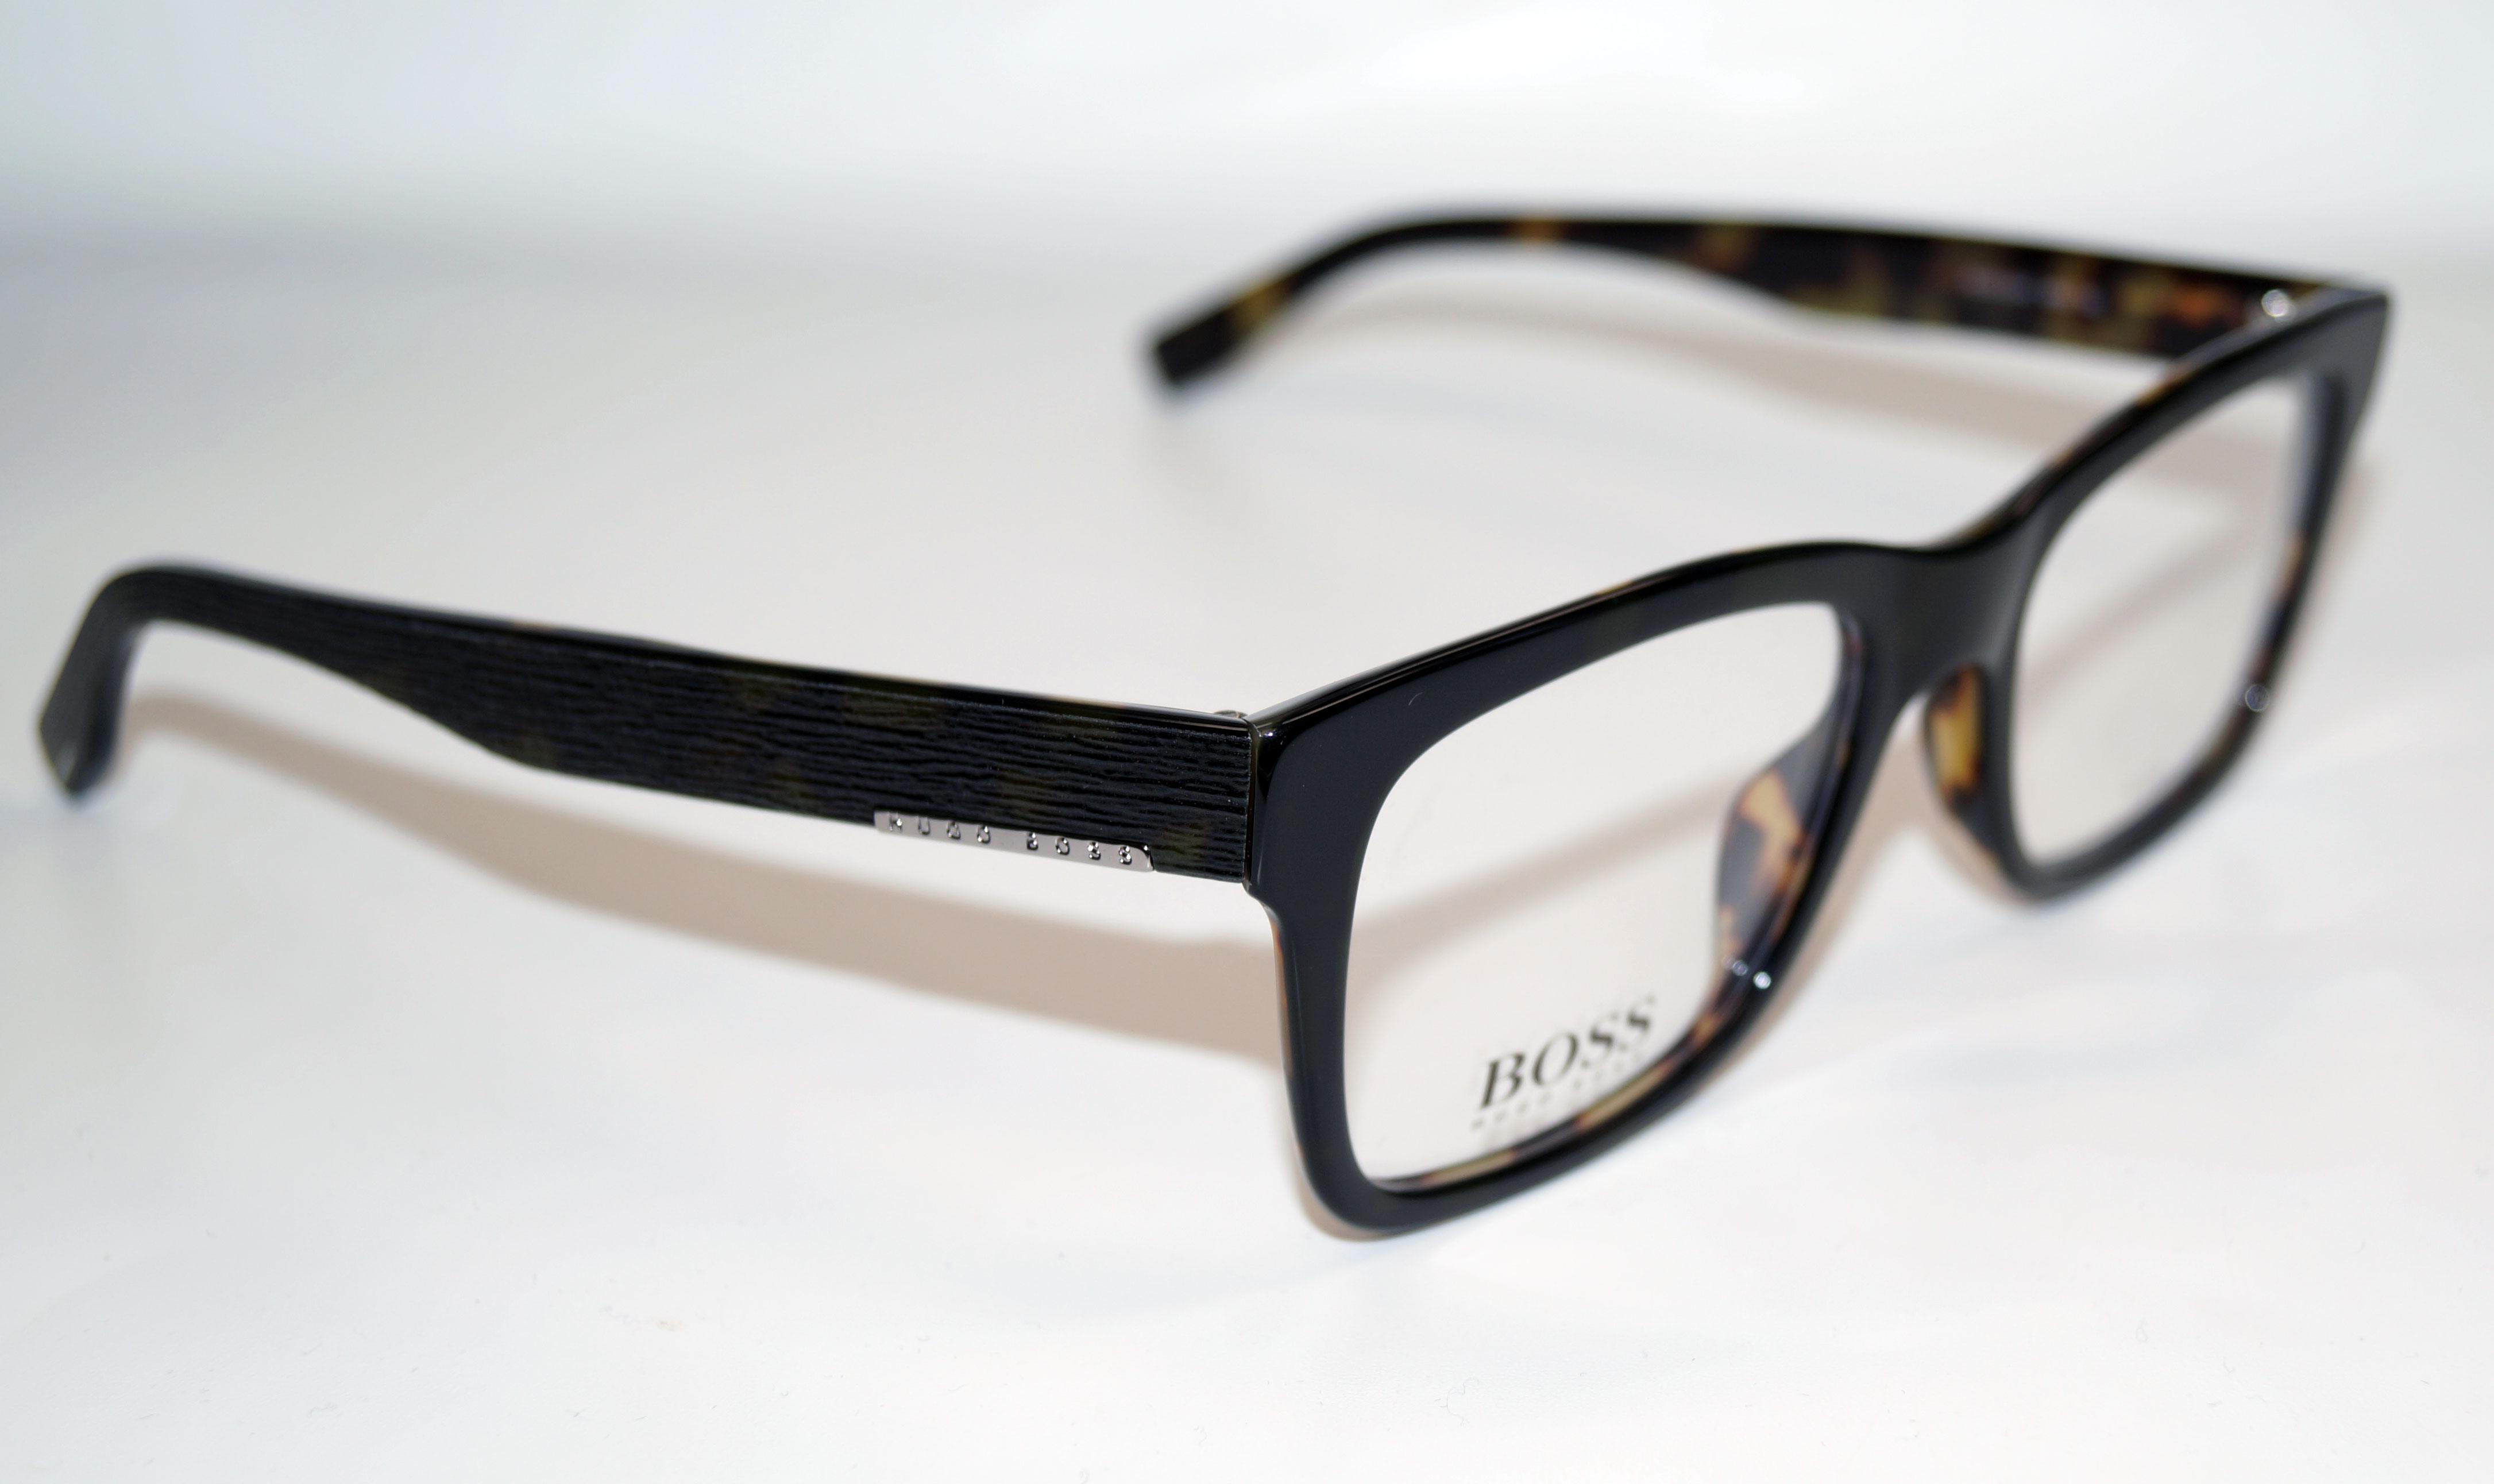 HUGO BOSS Brillenfassung Brillengestell Eyeglasses Frame BOSS 0641 HRM